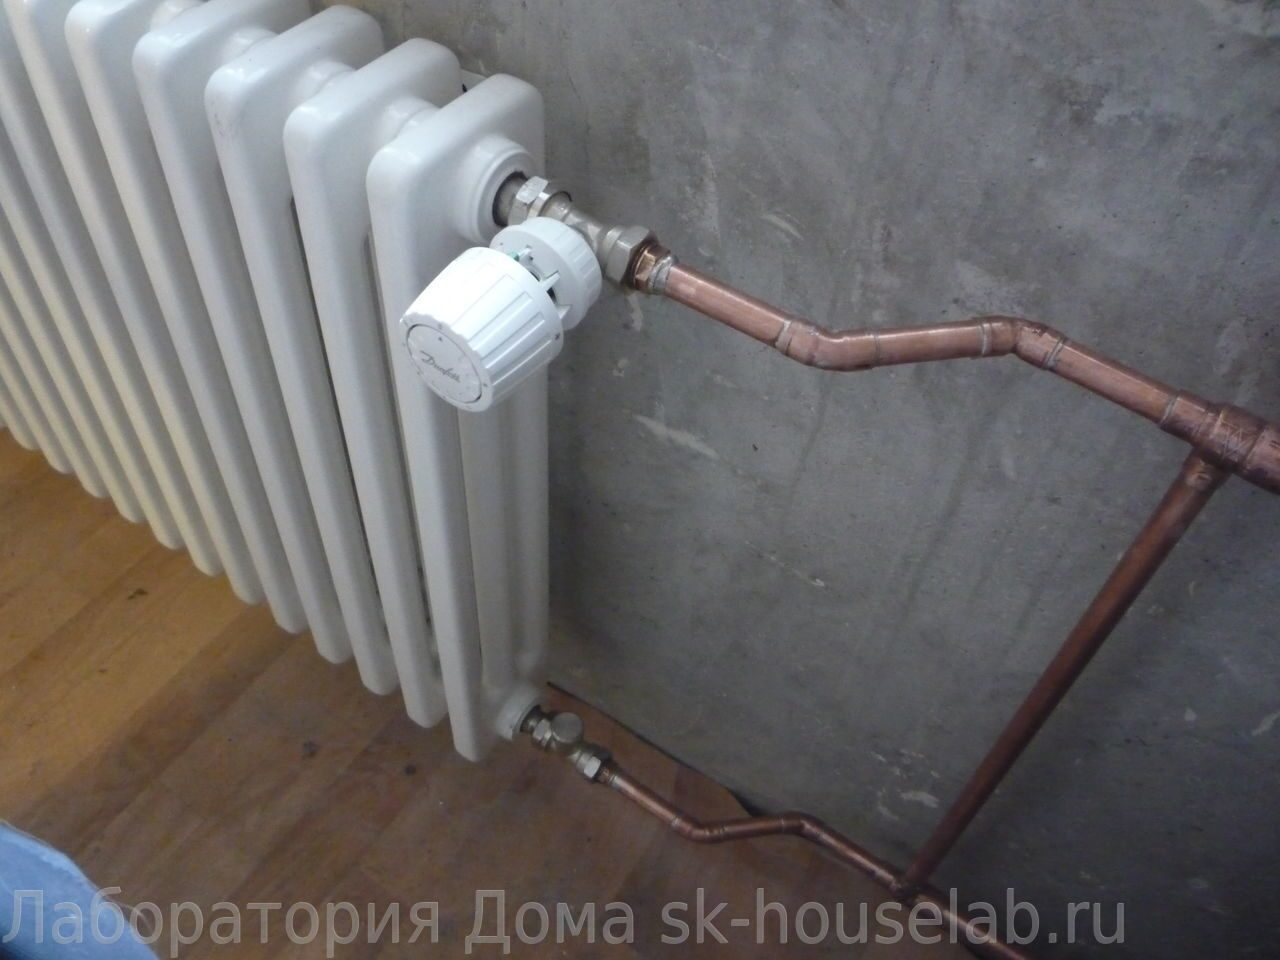 Схема разводки водопровода в частном доме